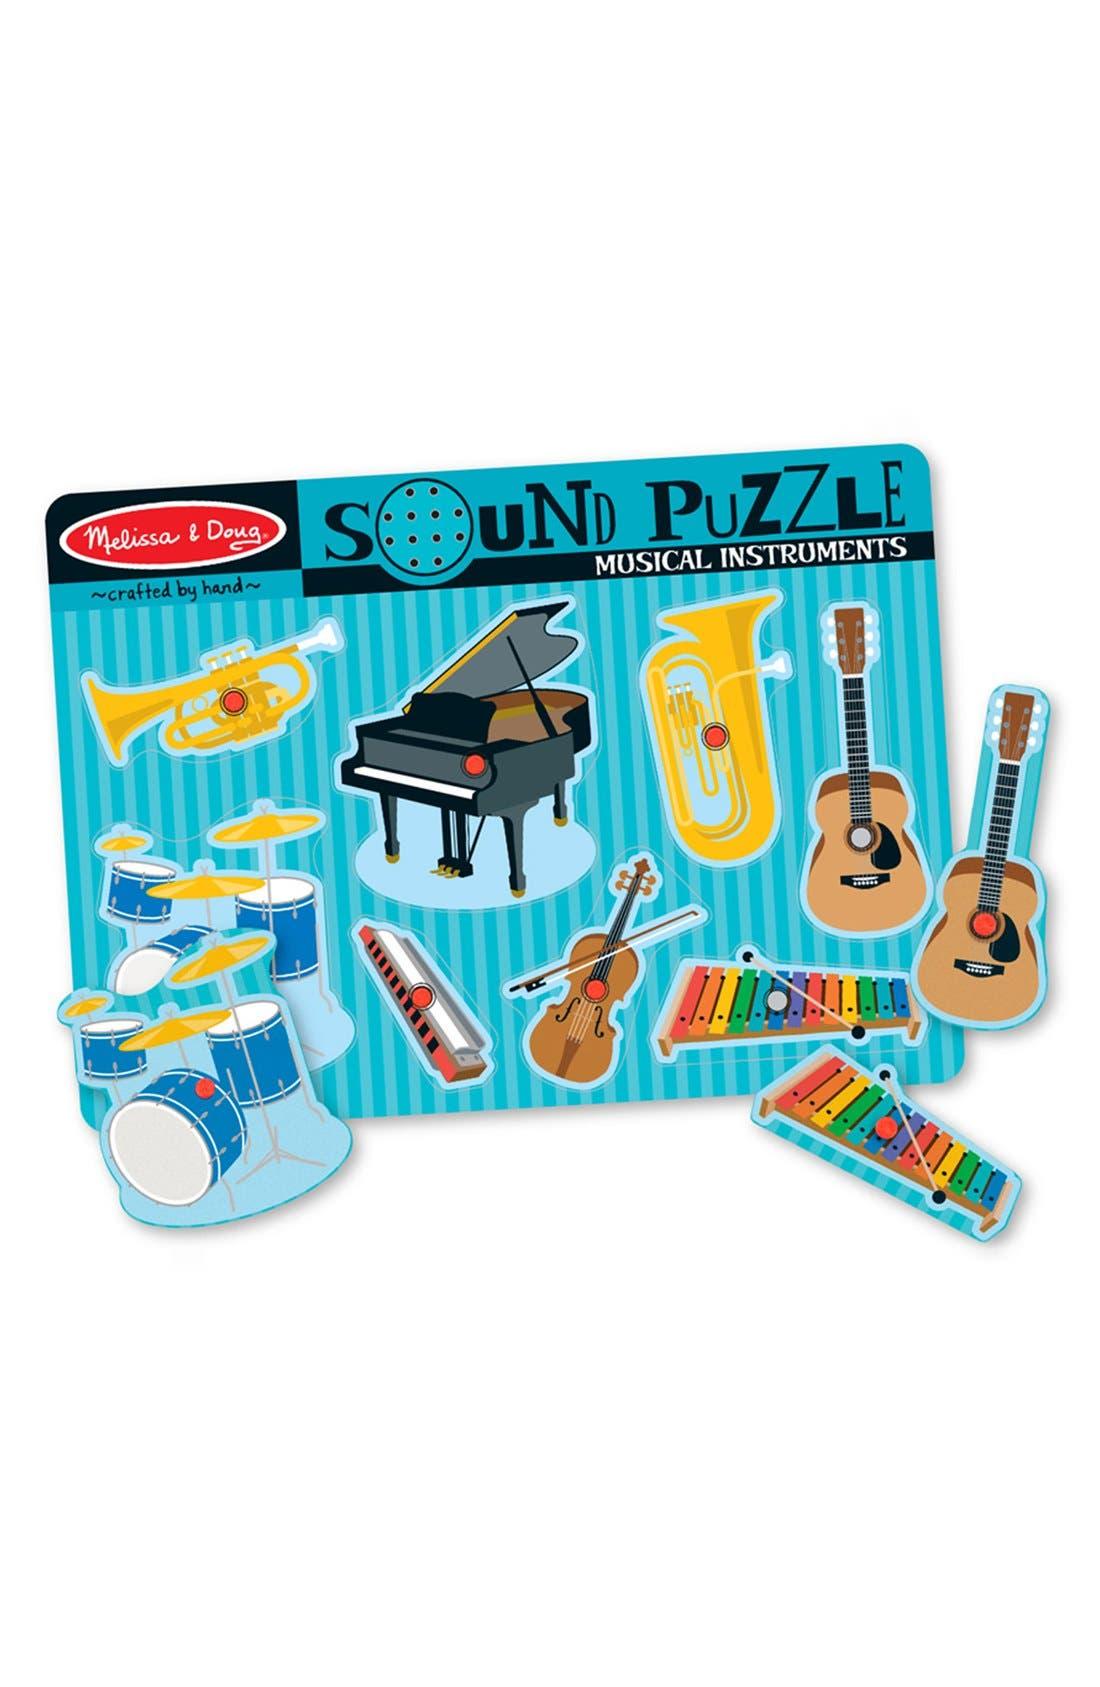 Melissa & Doug 'Musical Instruments' Sound Puzzle